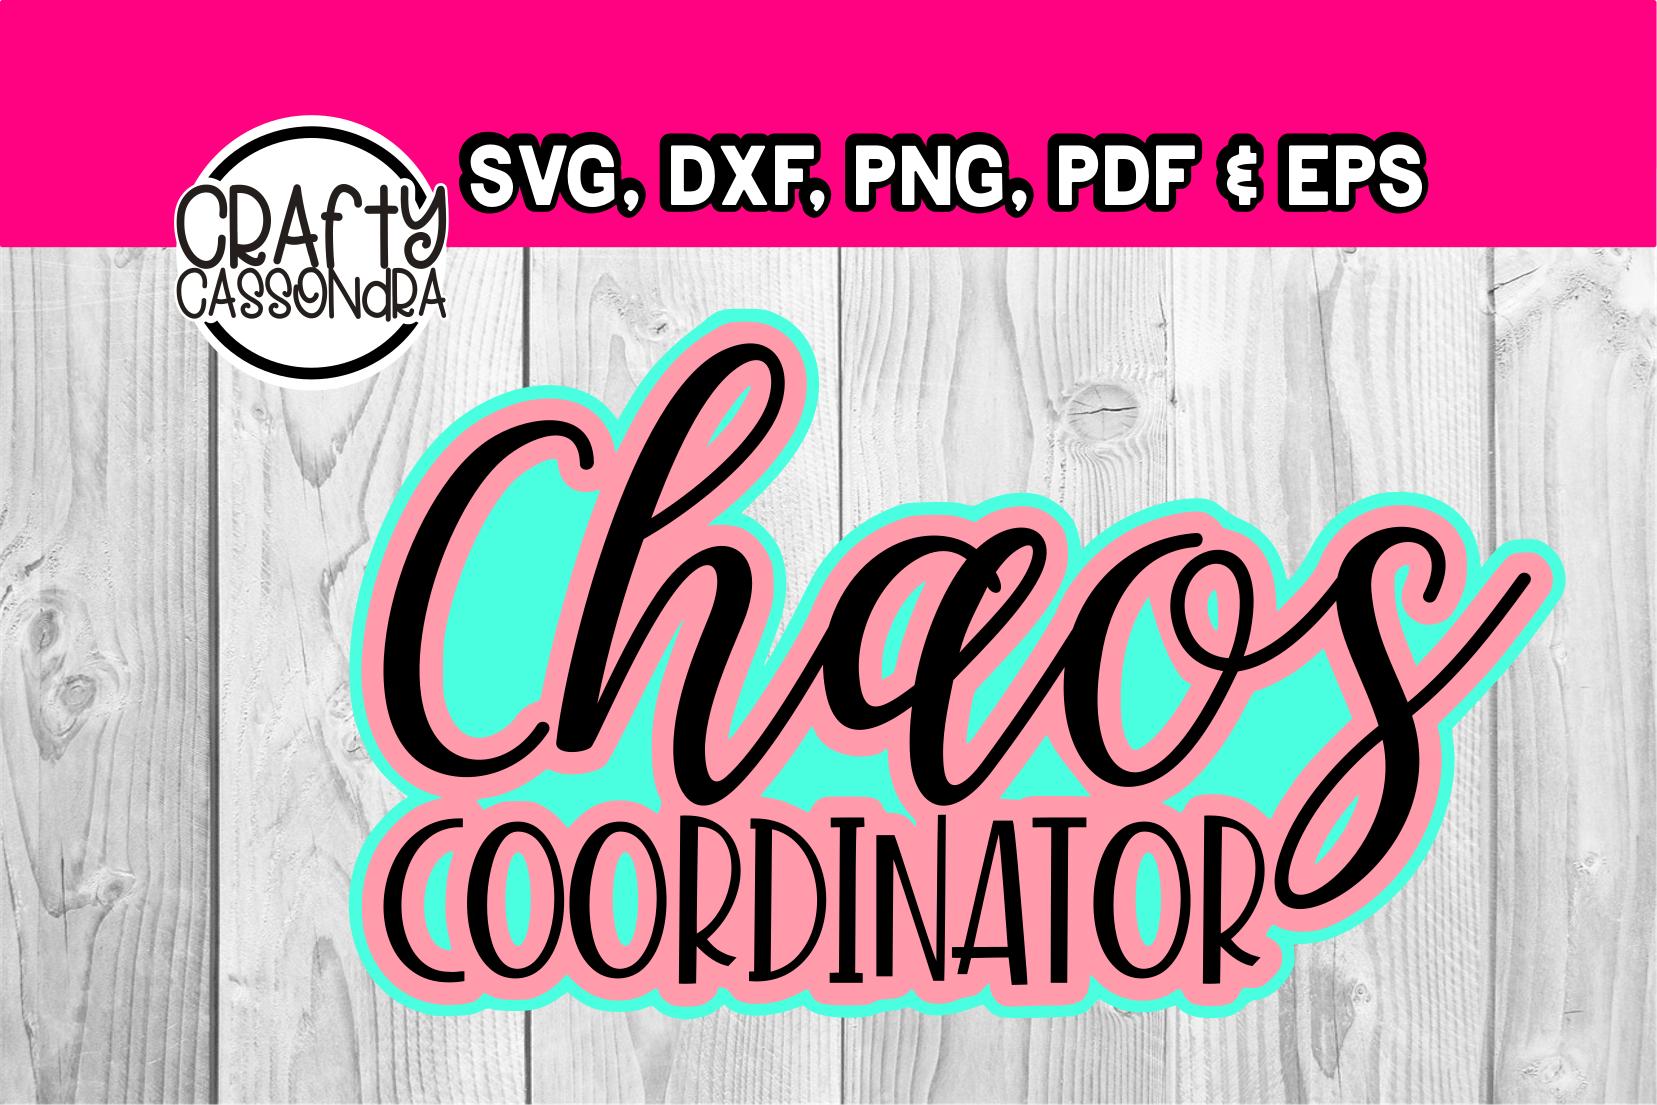 Chaos coordinator example image 1